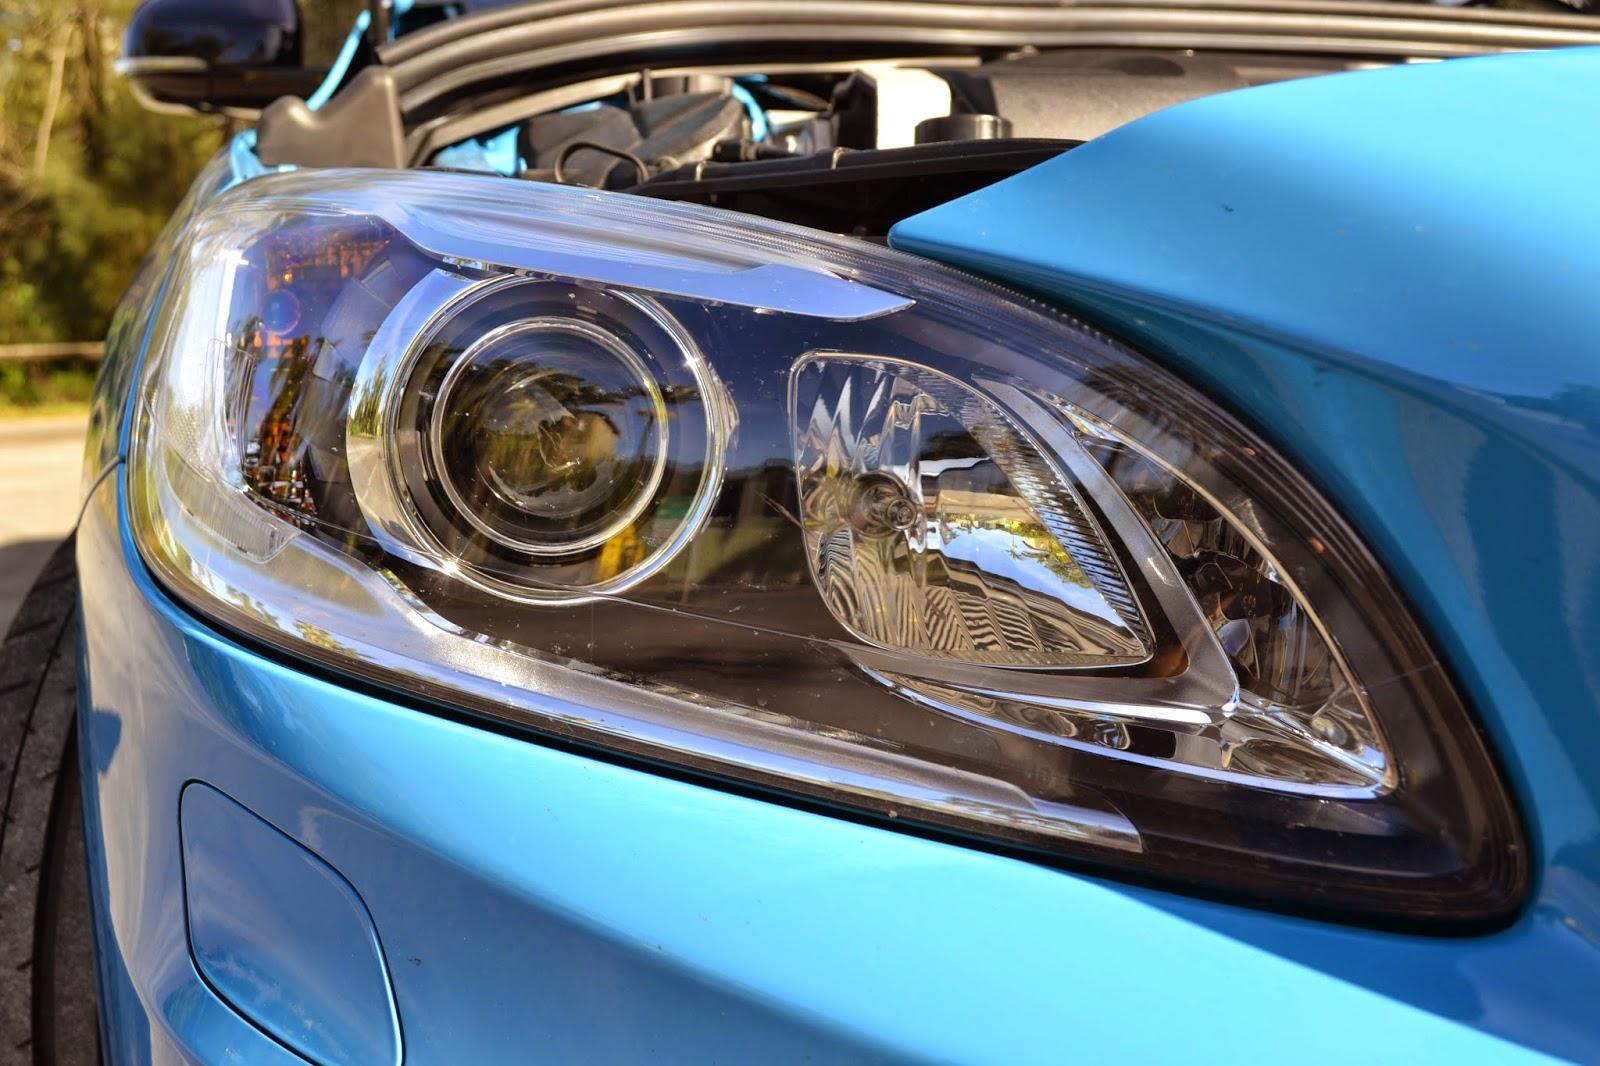 A close up of the V60's active xenon headlights